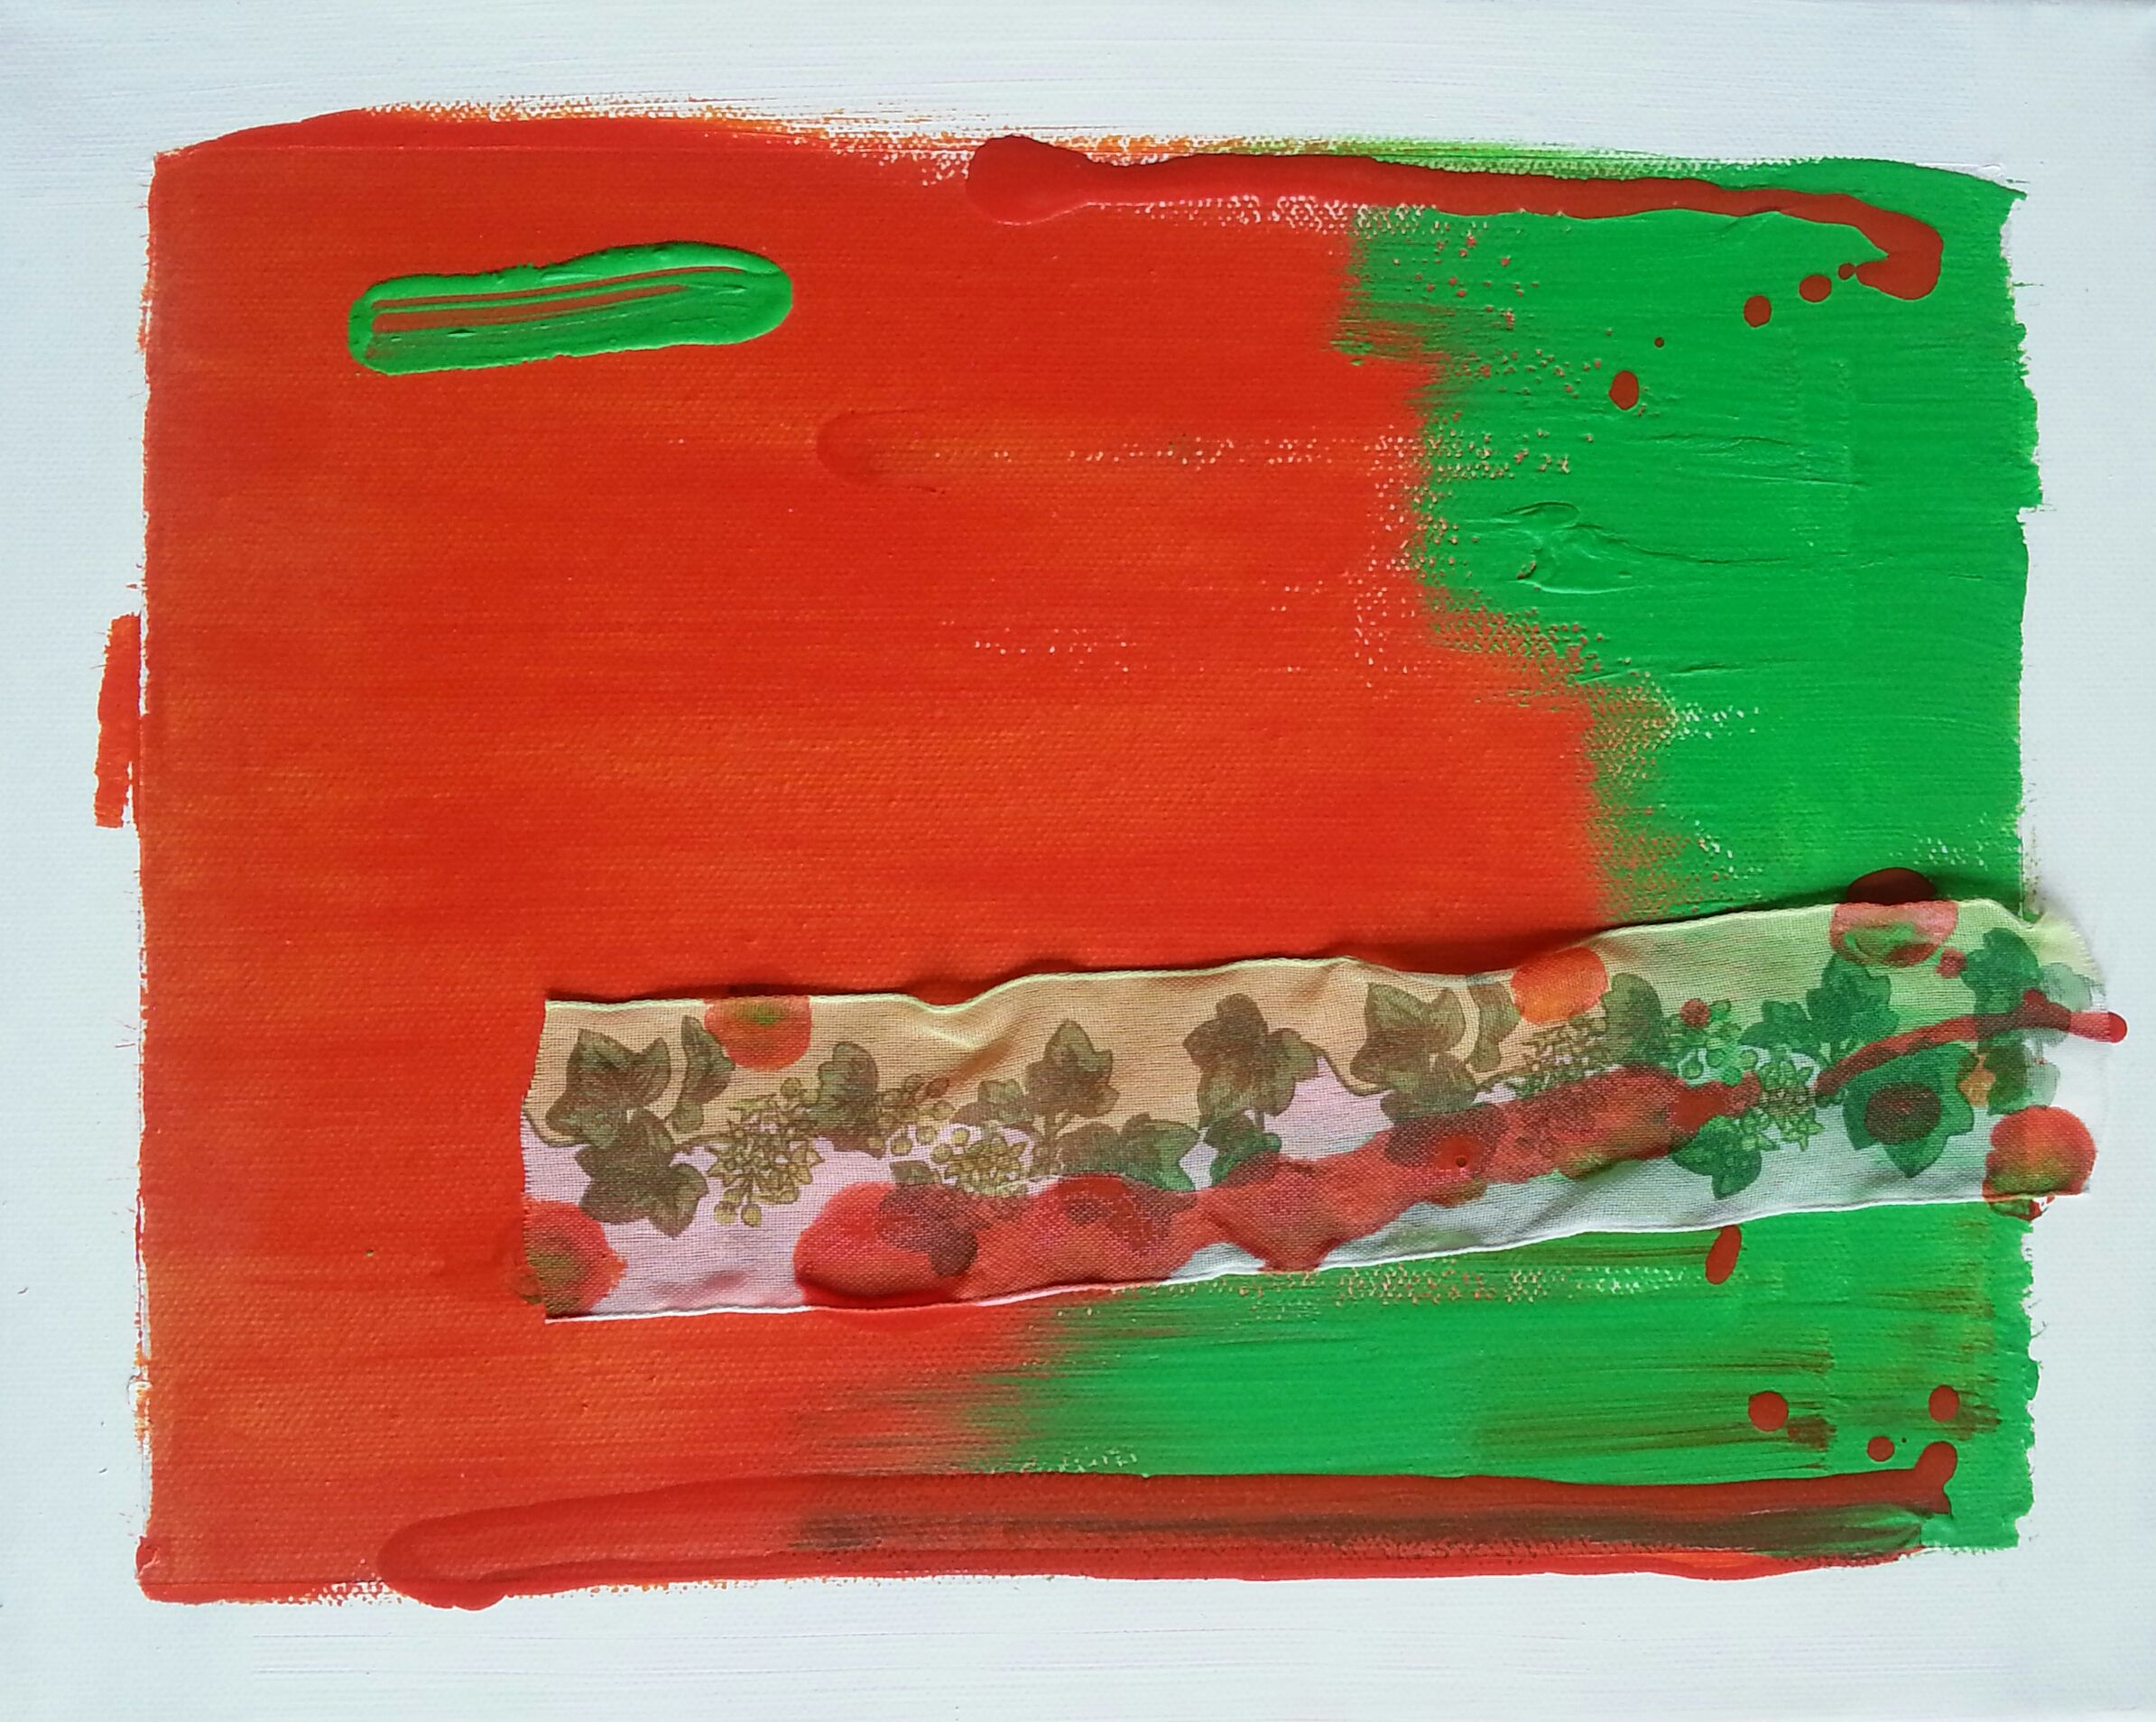 VEGETAZIONE 1 - acrylic and cloth on canvas - cm. 20x30 ...by Zeno Travegan (Enzo Gravante)